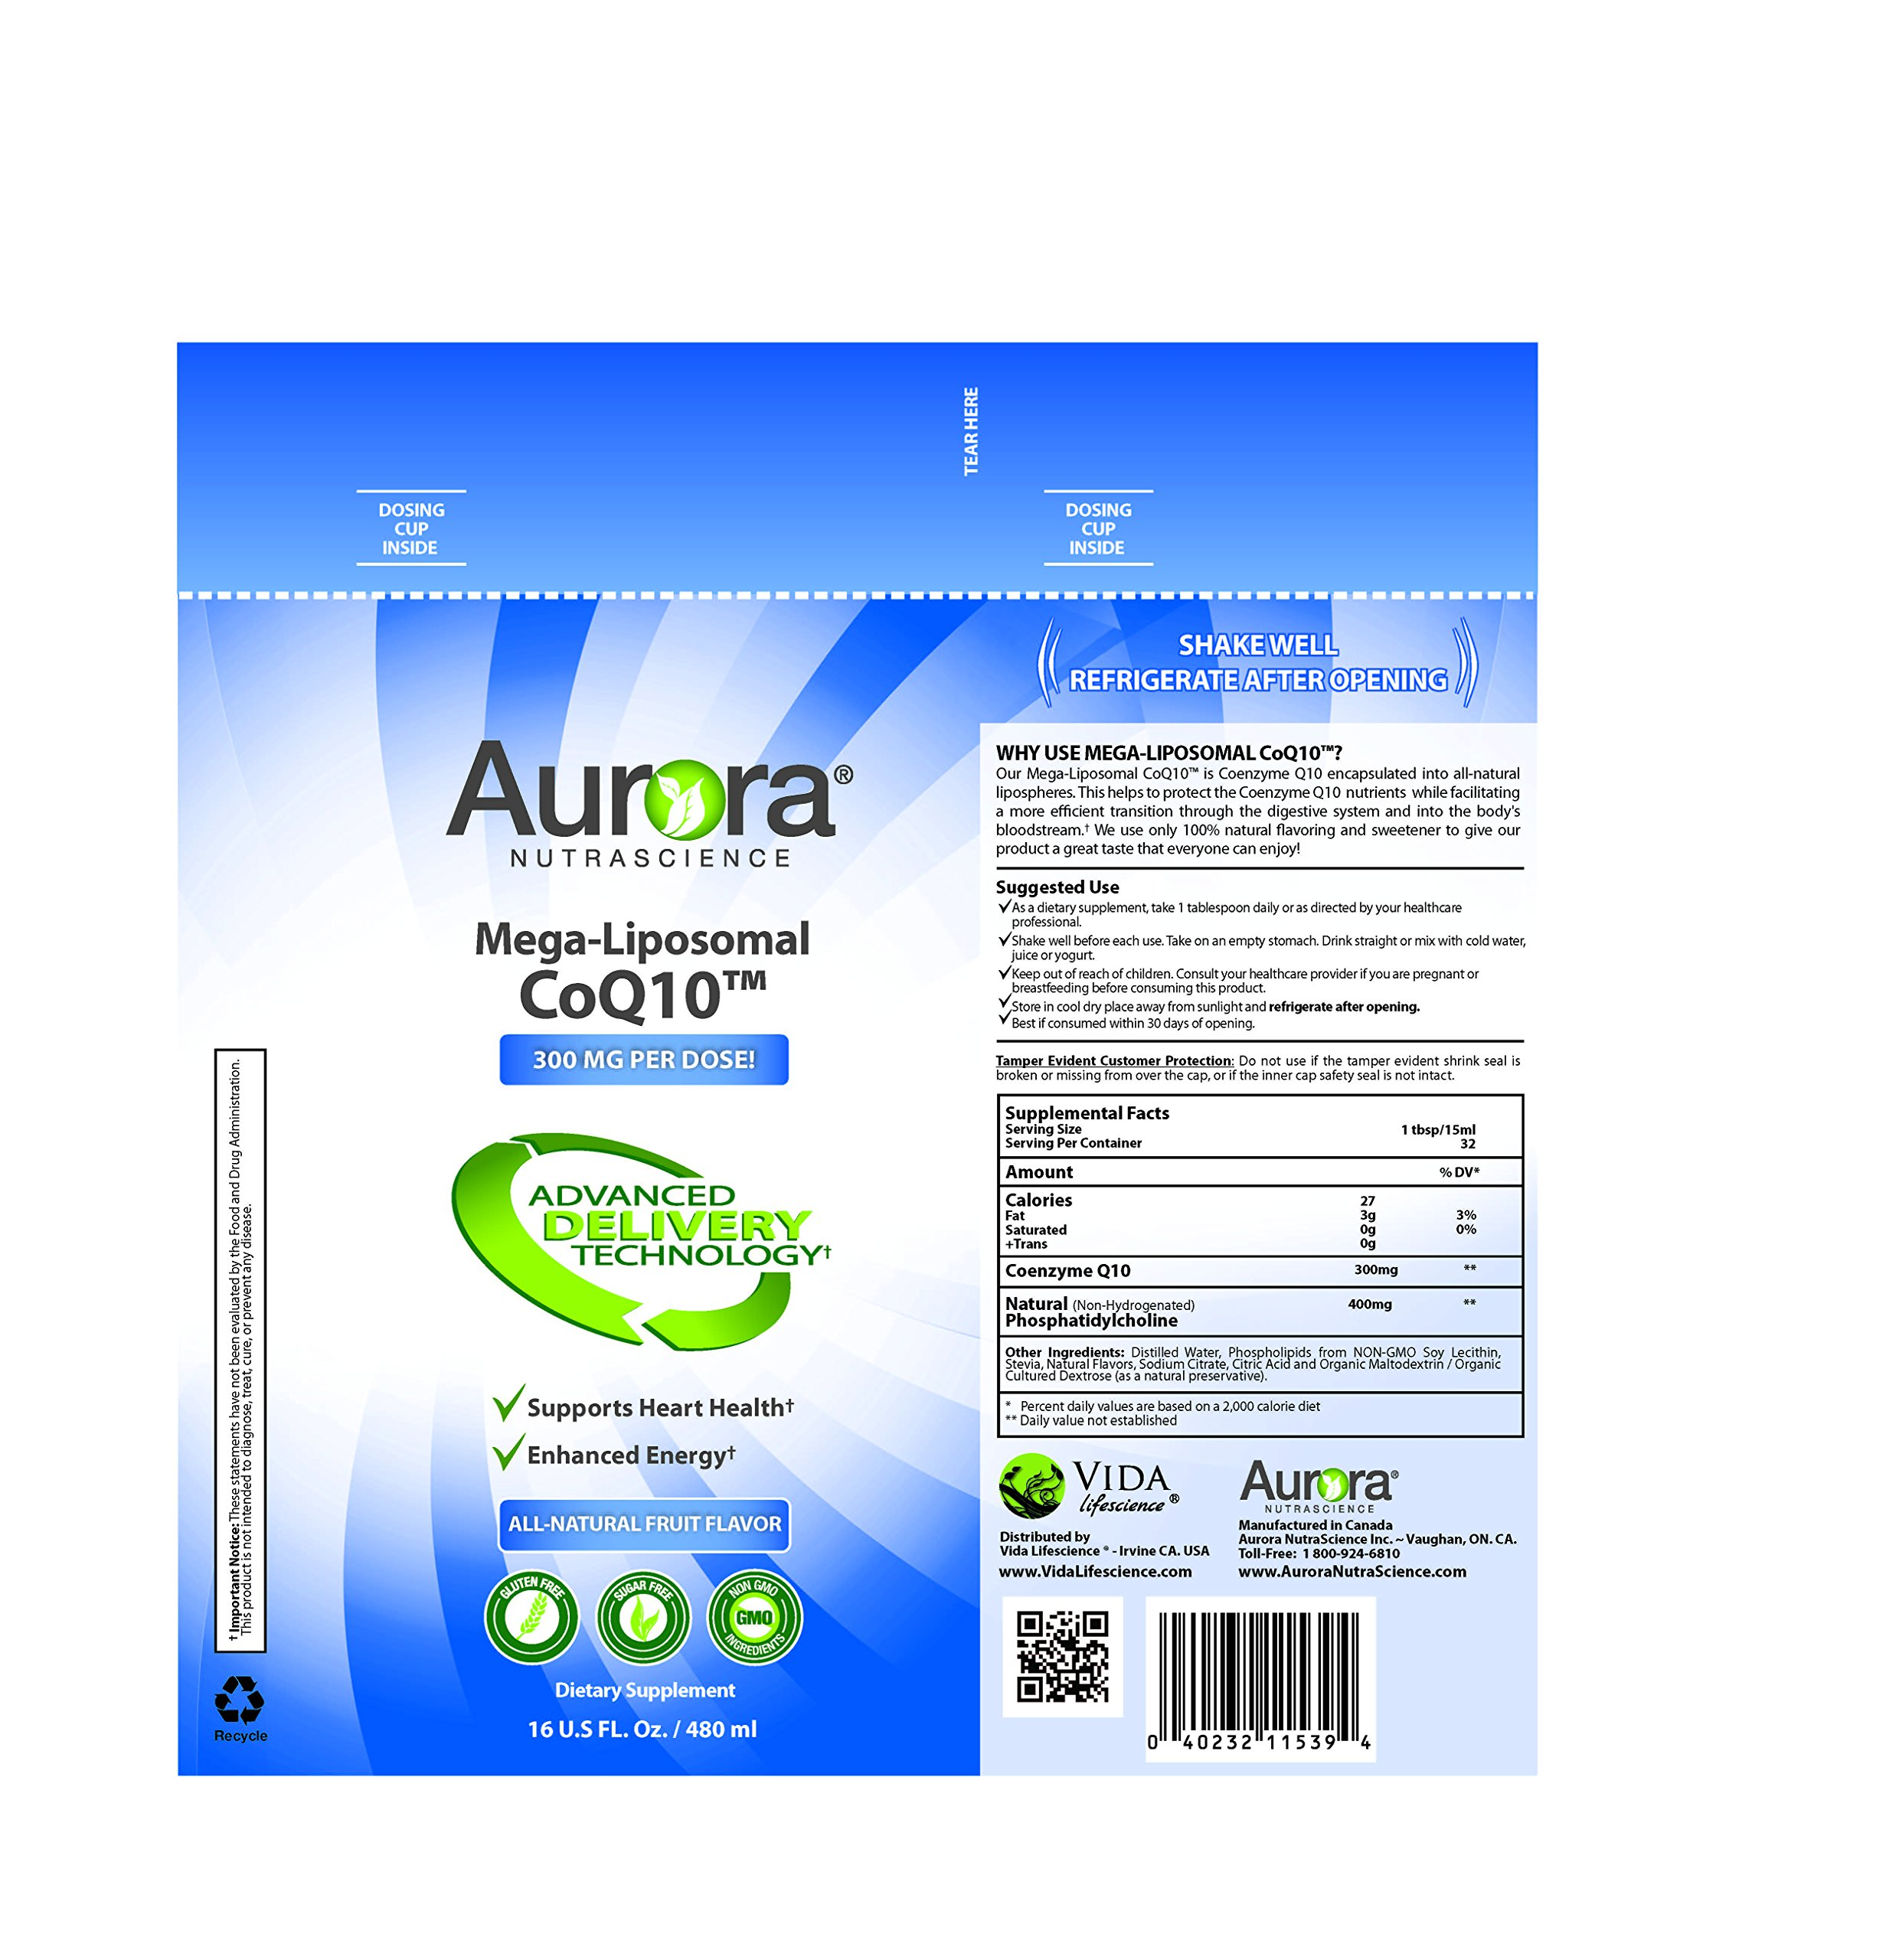 Aurora Nutrascience Mega Liposomal COQ10-16 oz